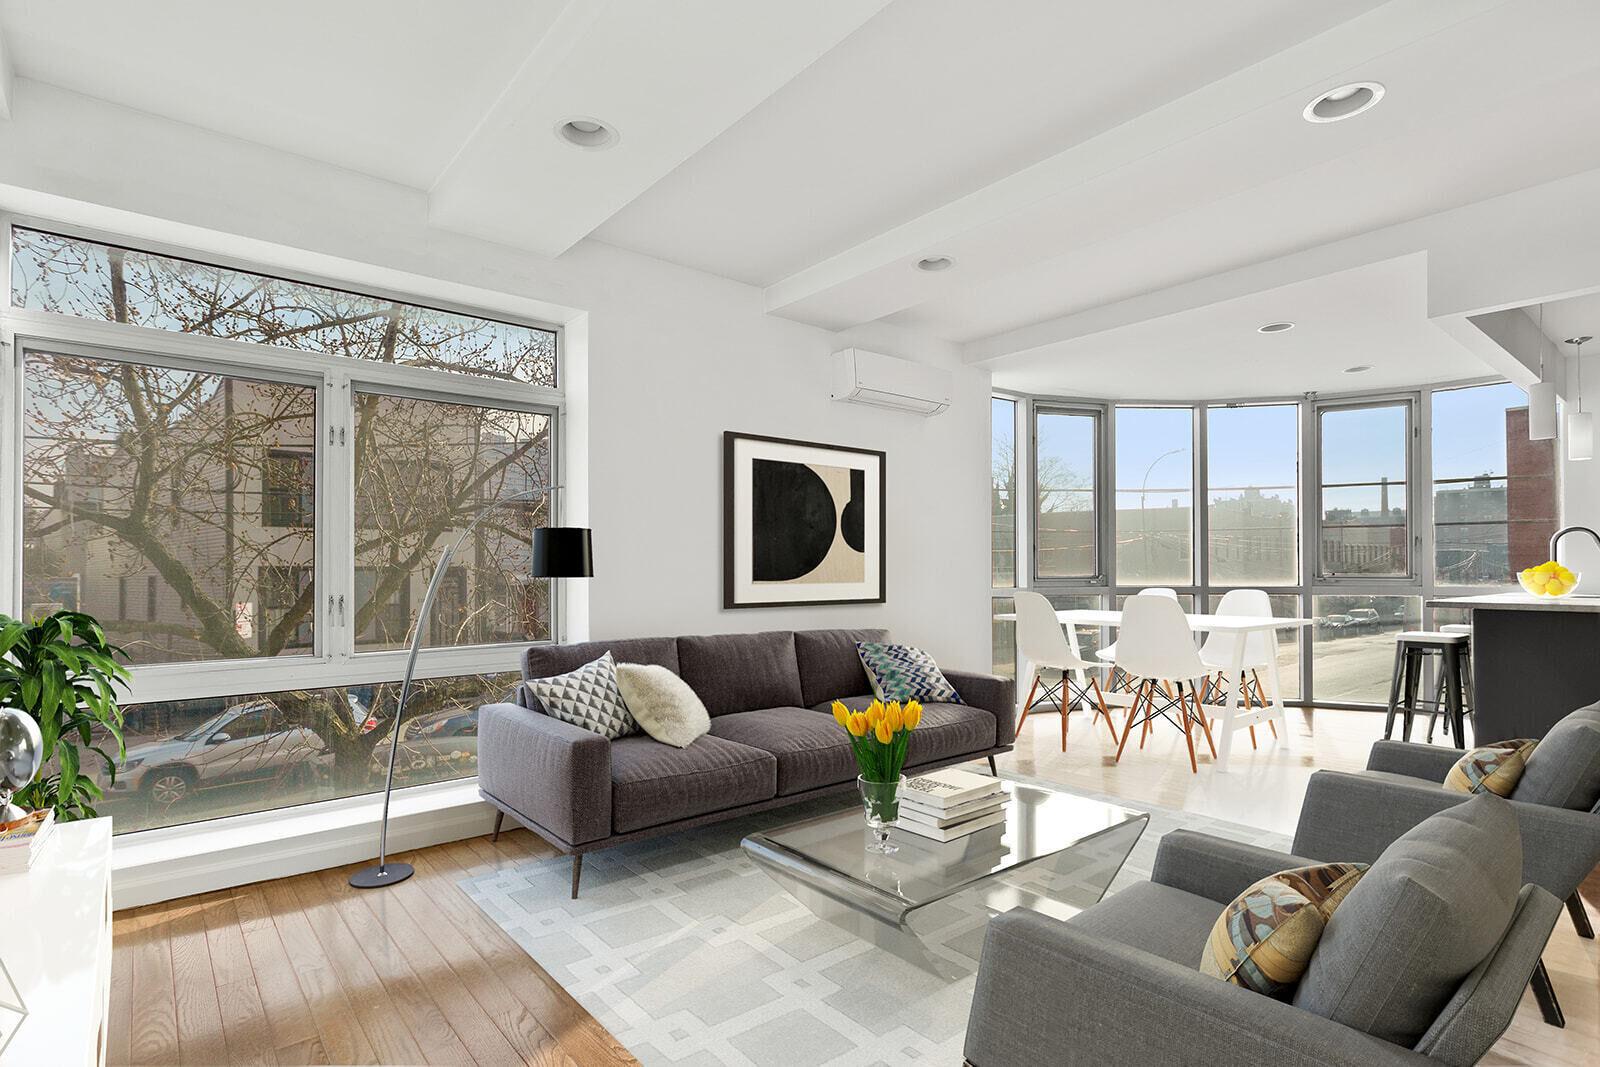 Apartment for sale at 117 Kingsland Avenue, Apt 2-A